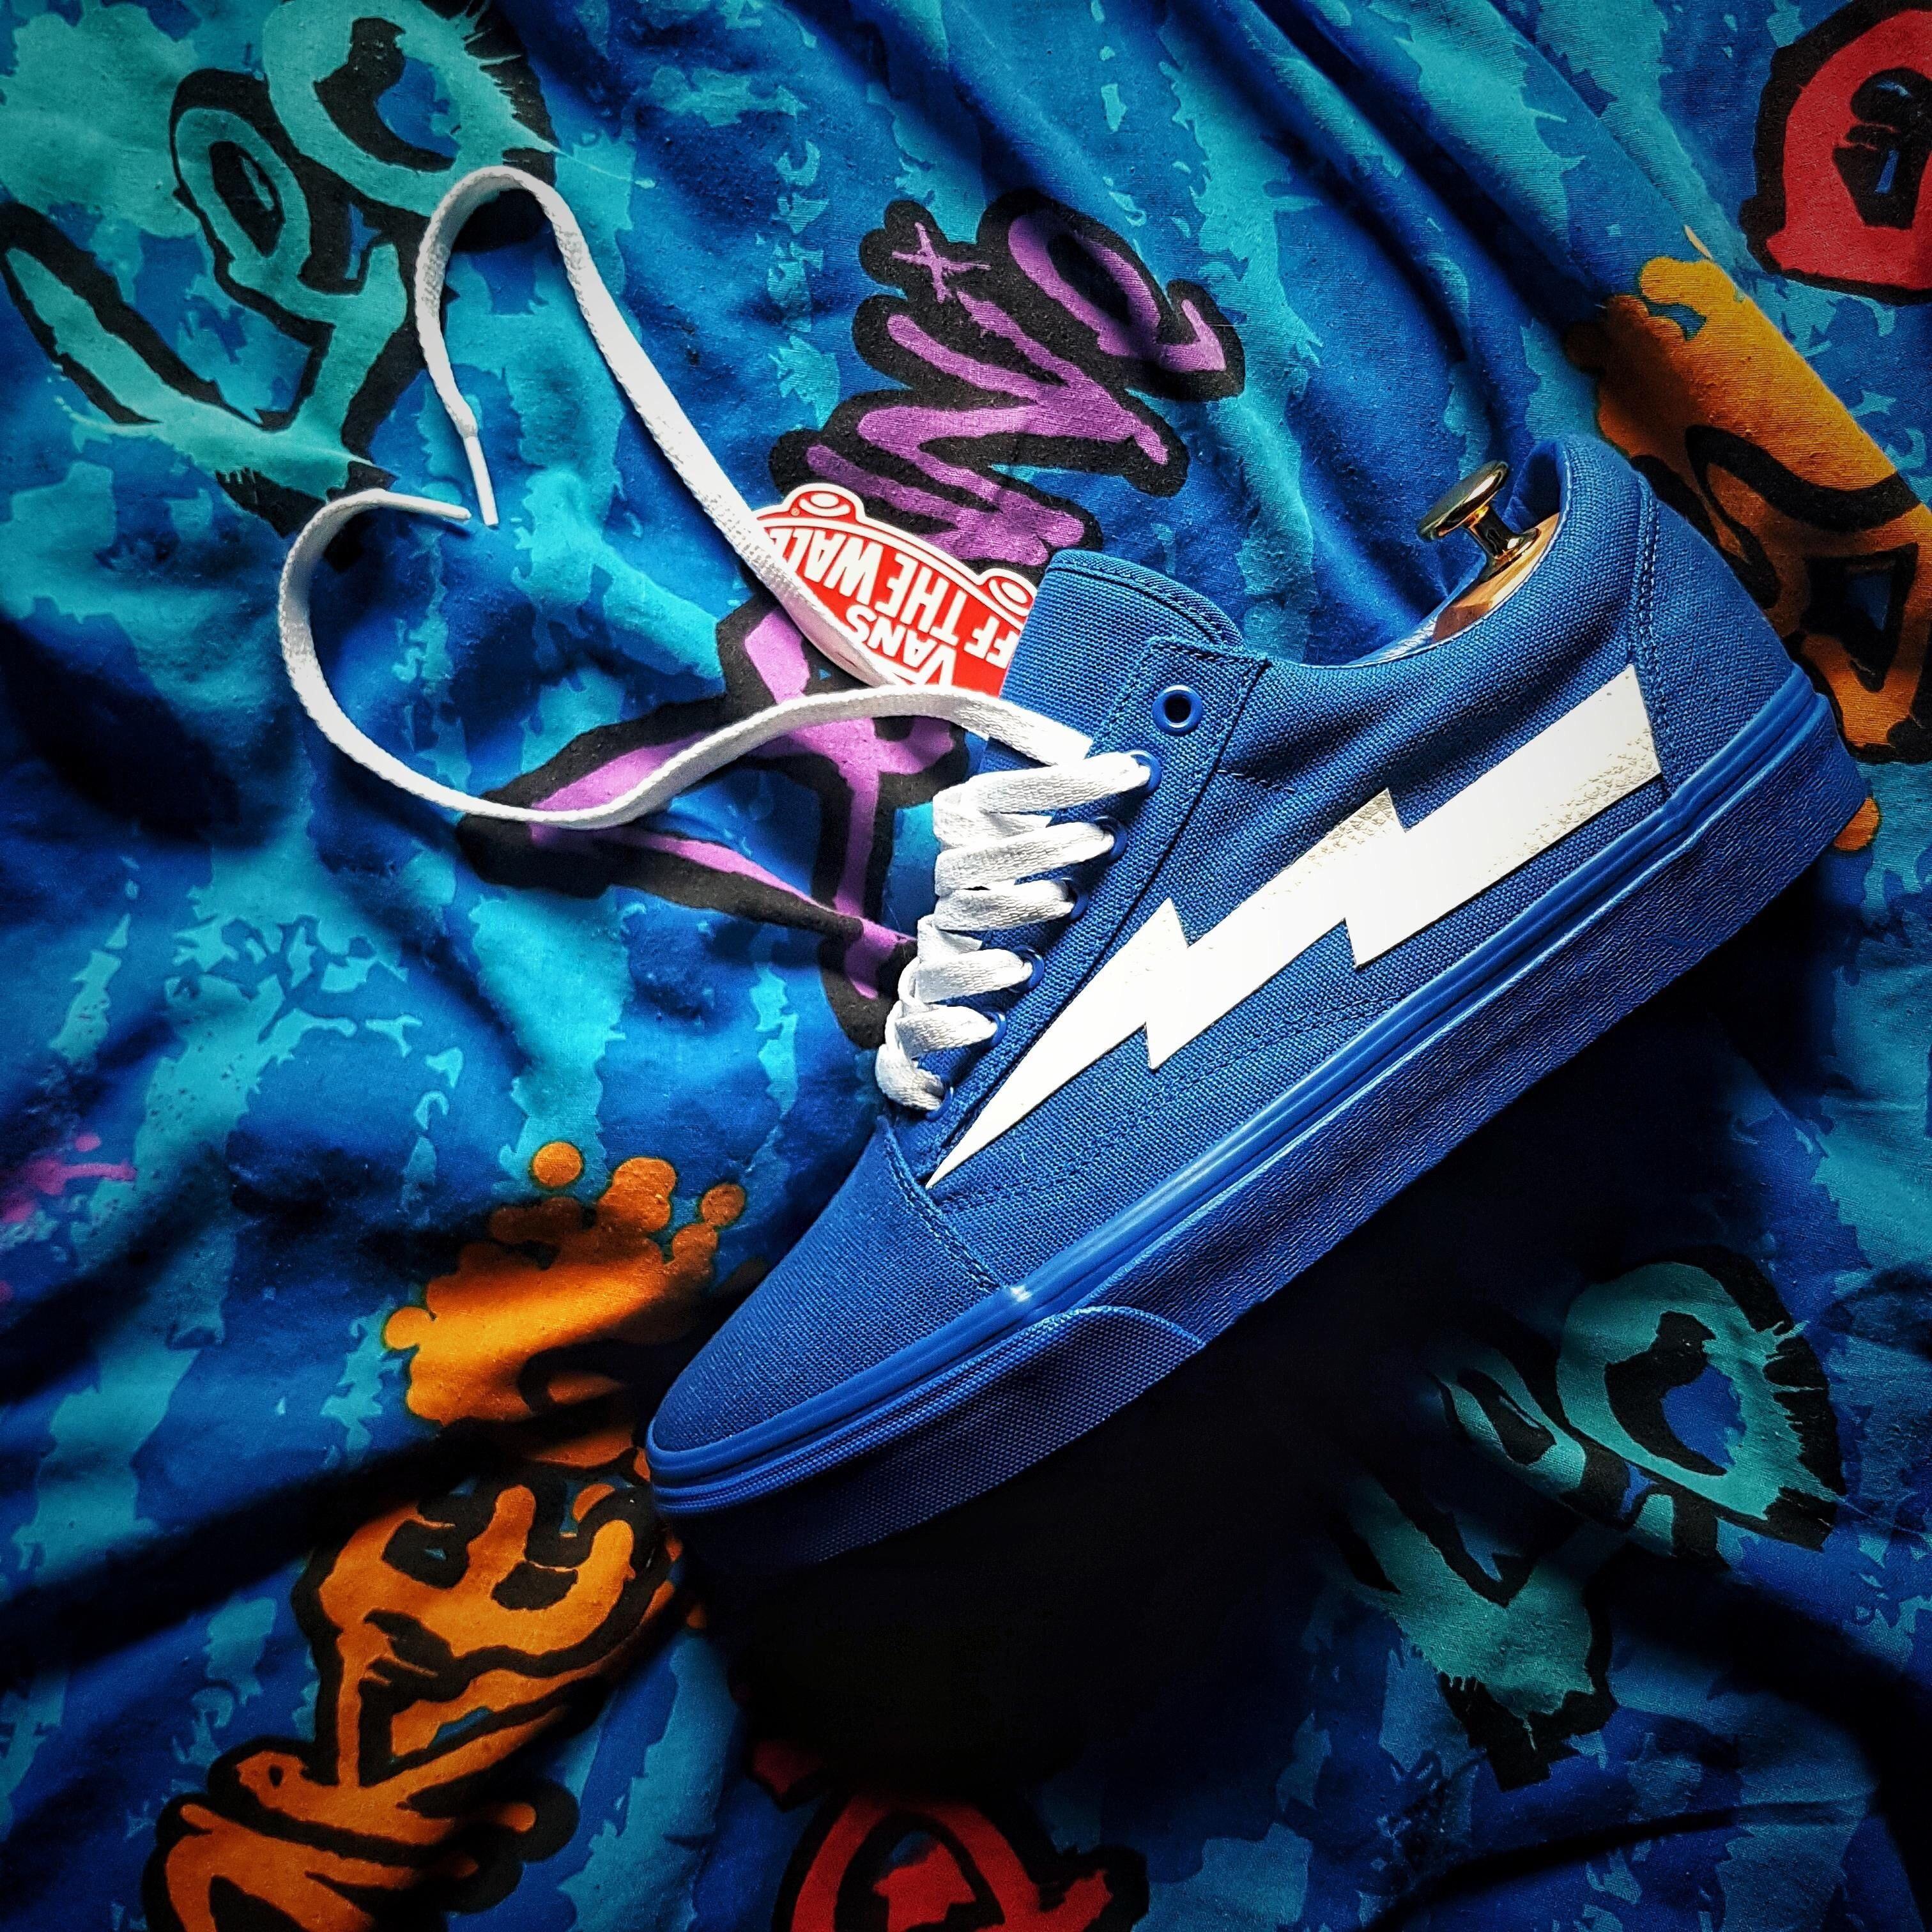 Vans Revenge X Storm Http Ift Tt 2rsqsq8 Hype Shoes Vans Sneaker Head